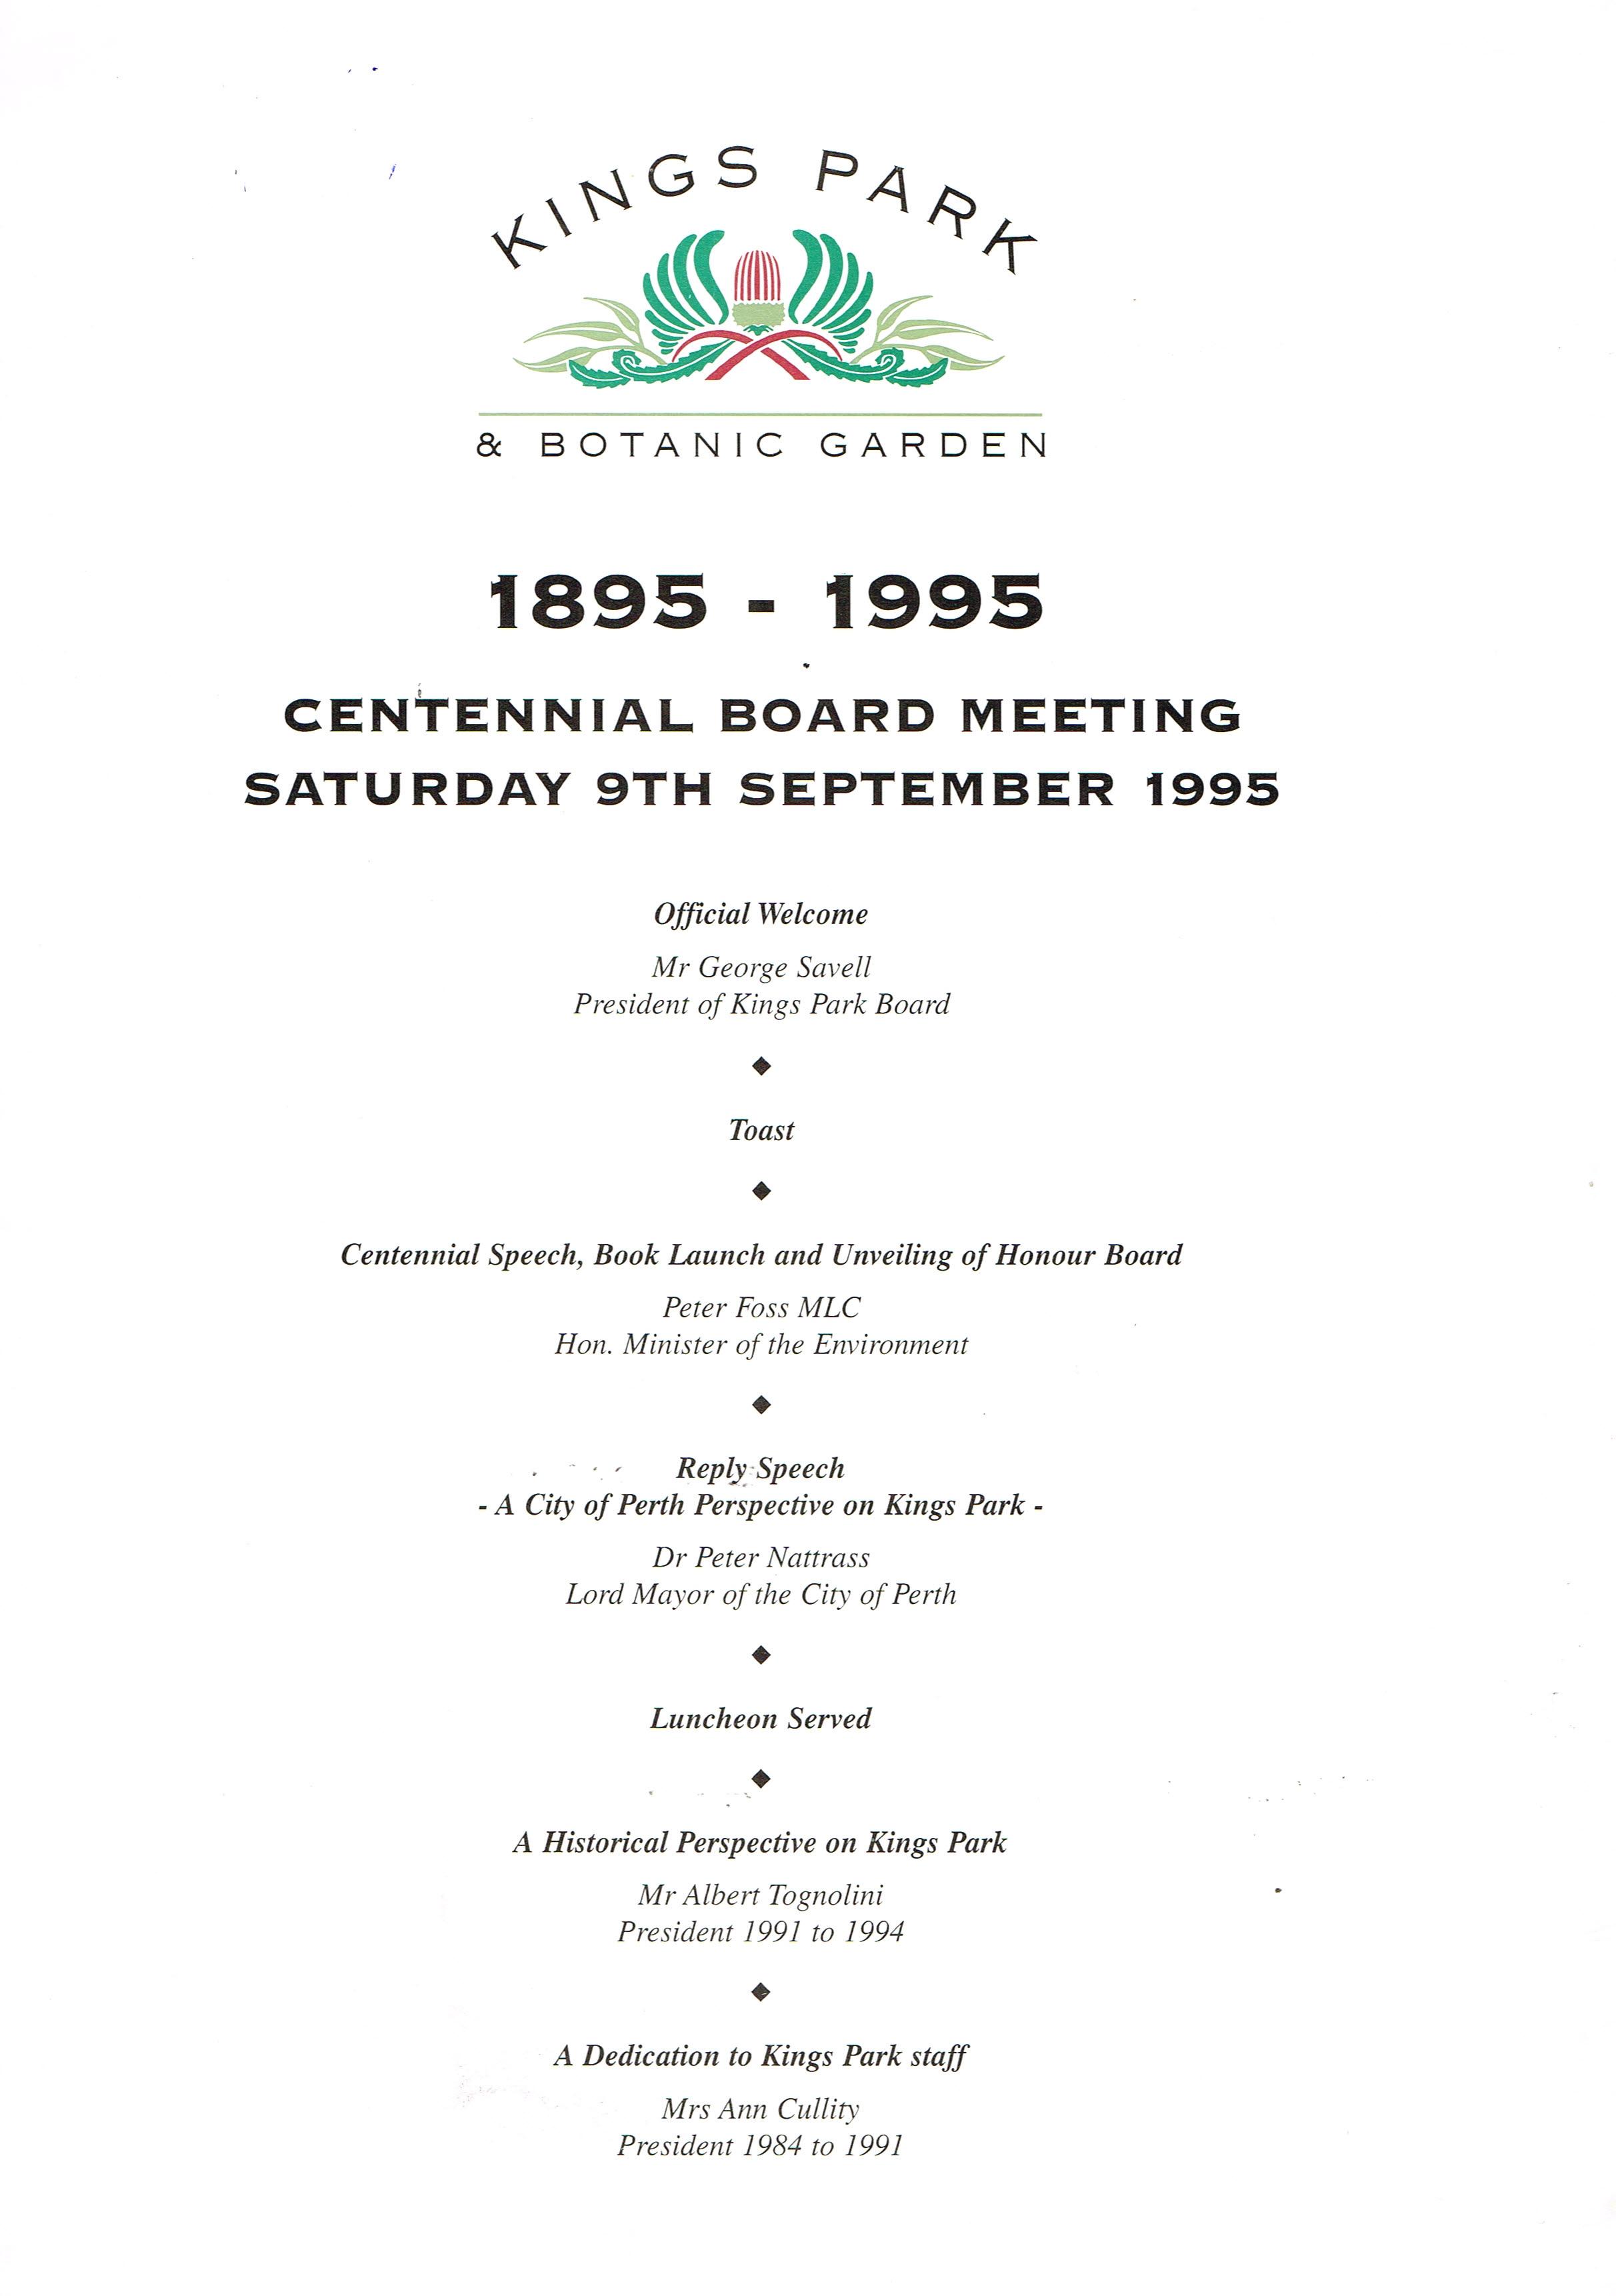 Kings Park Centennial Board Meeting.jpg